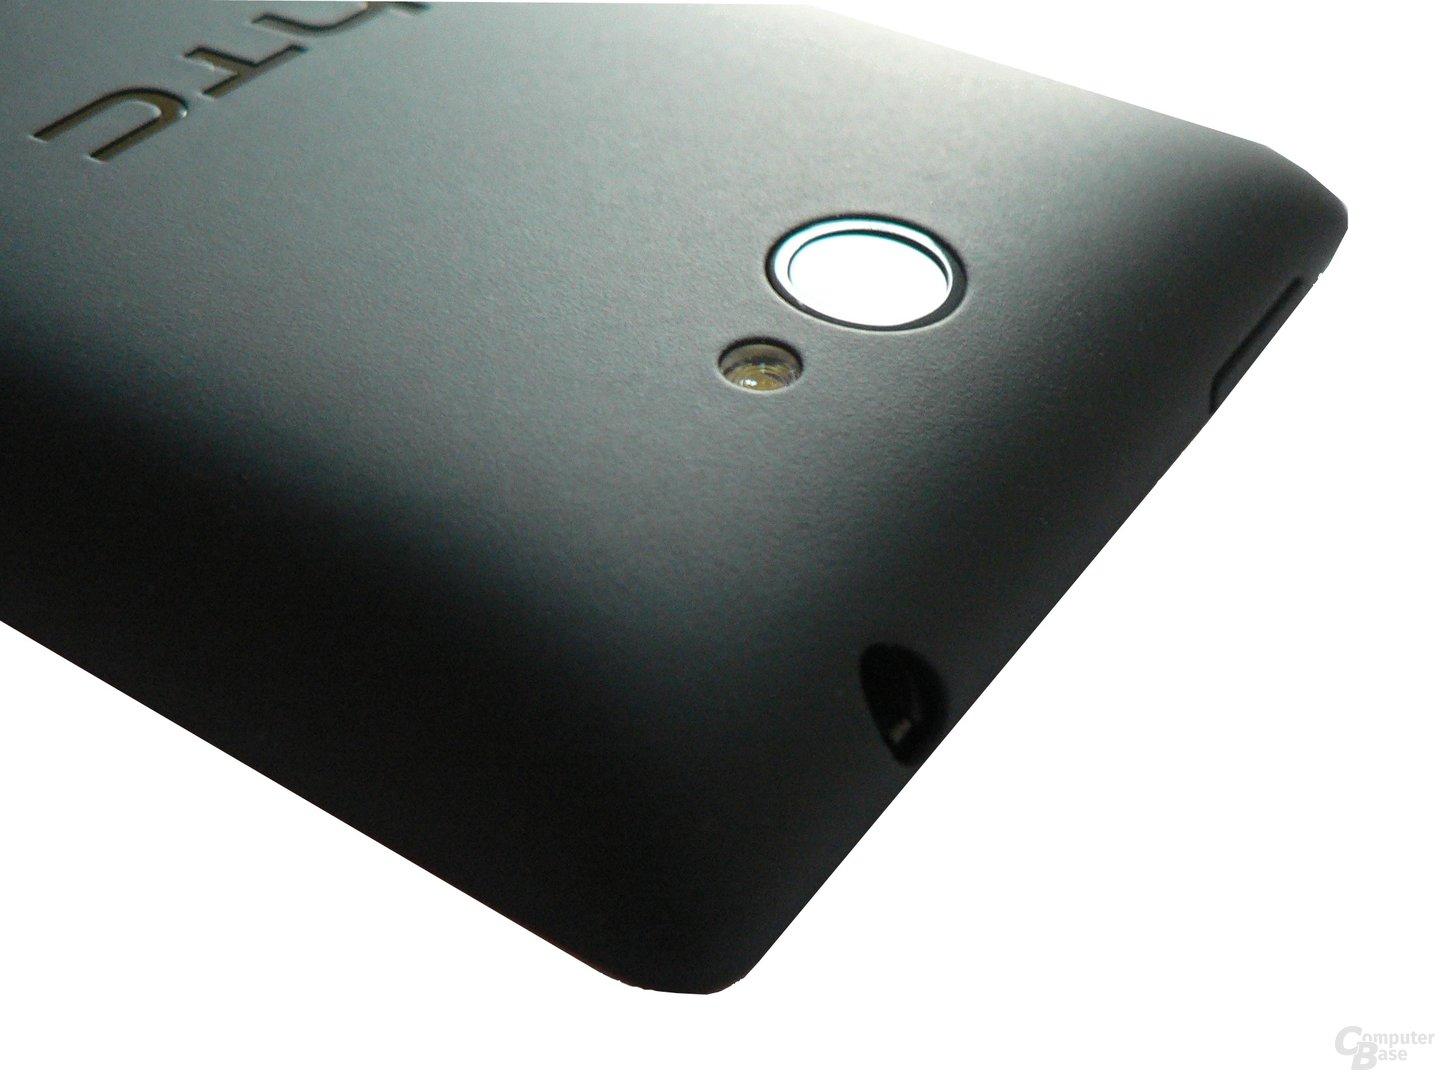 HTC 8S – Kamera-Linse